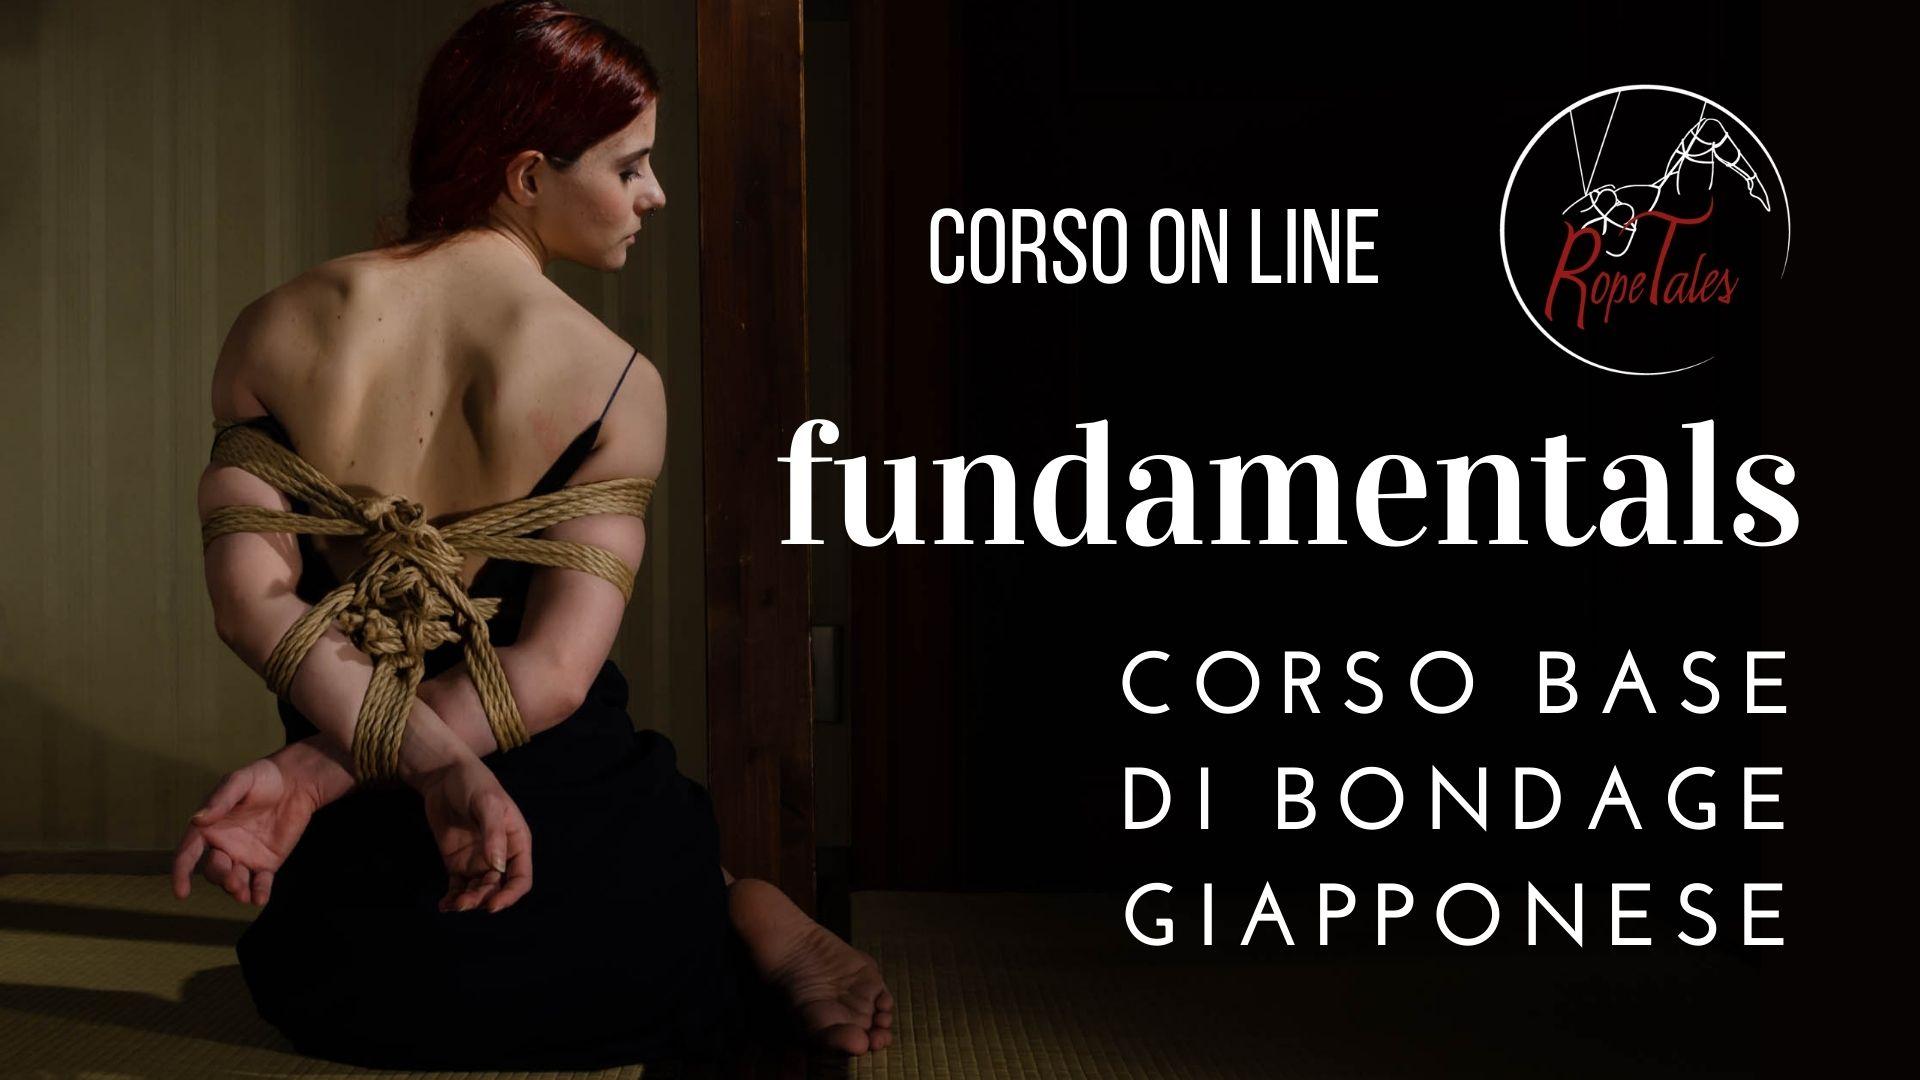 Corso-Bondage-Online (2)